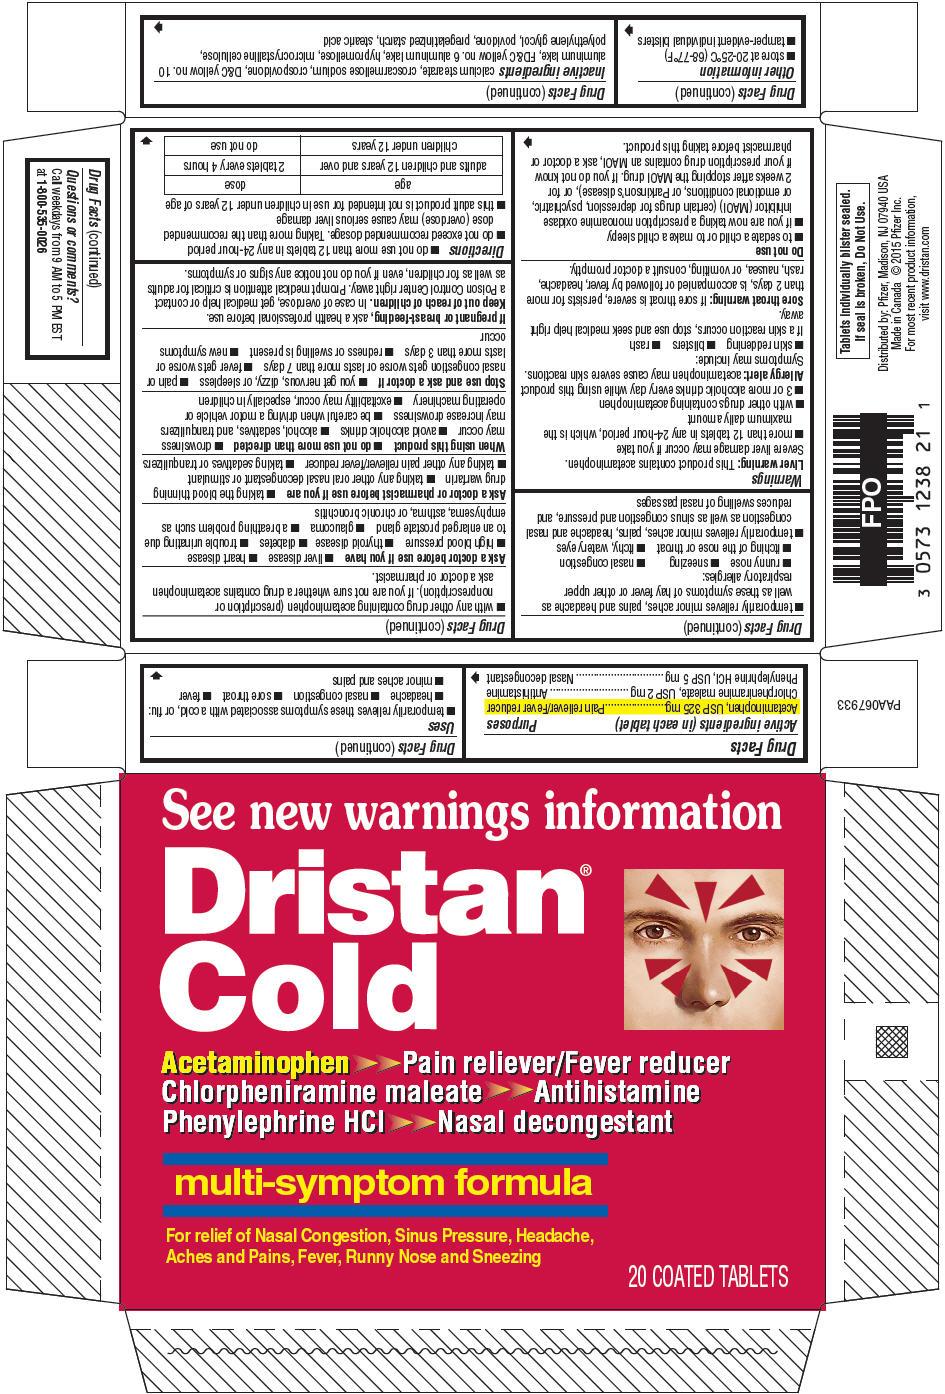 PRINCIPAL DISPLAY PANEL - 20 Tablet Blister Pack Carton